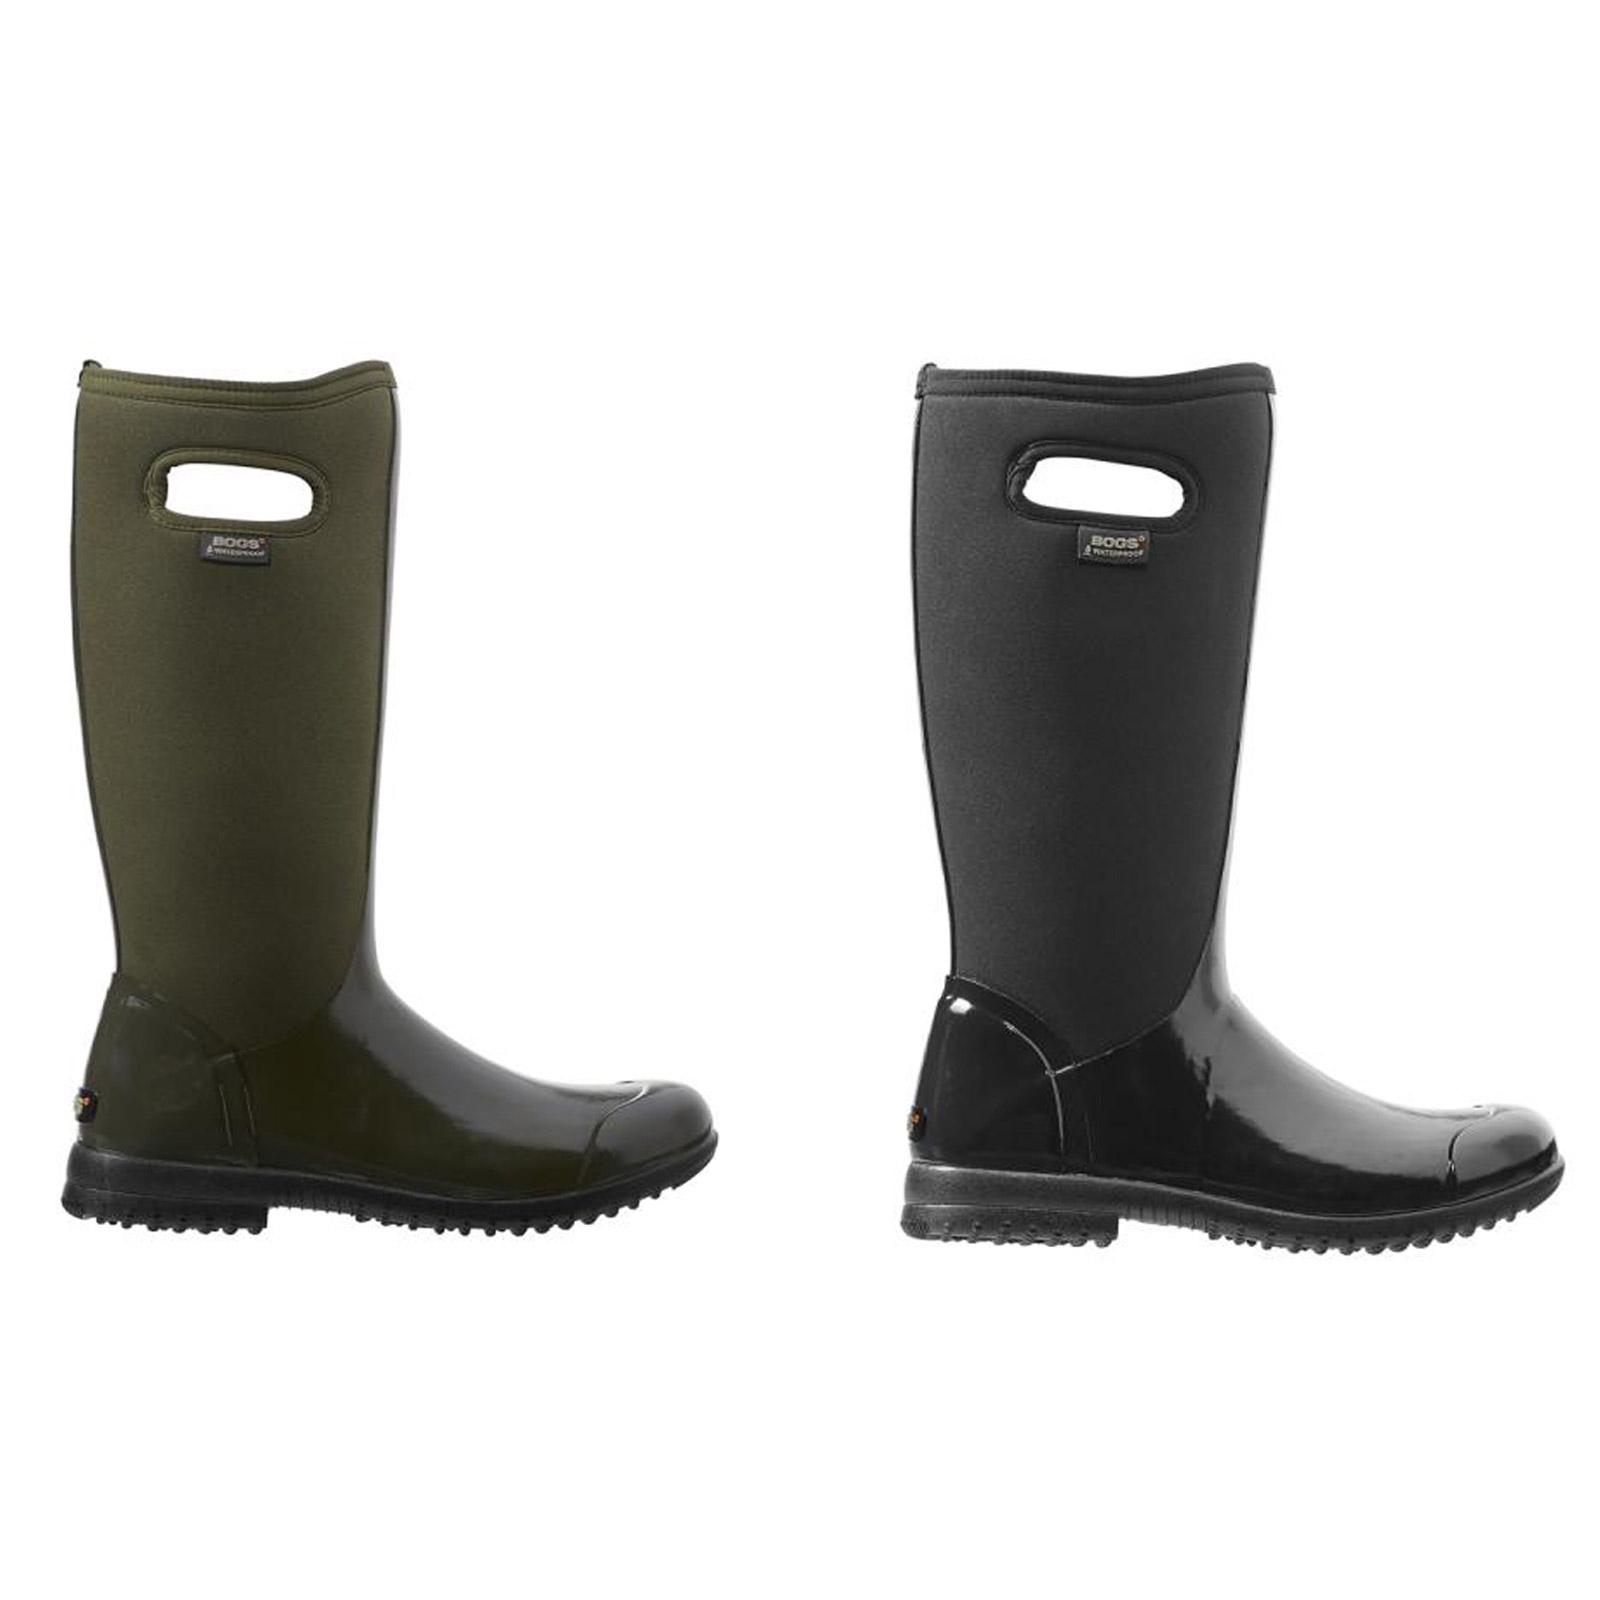 Bogs 71768 Women's Sidney Tall Waterproof Insulated Pull